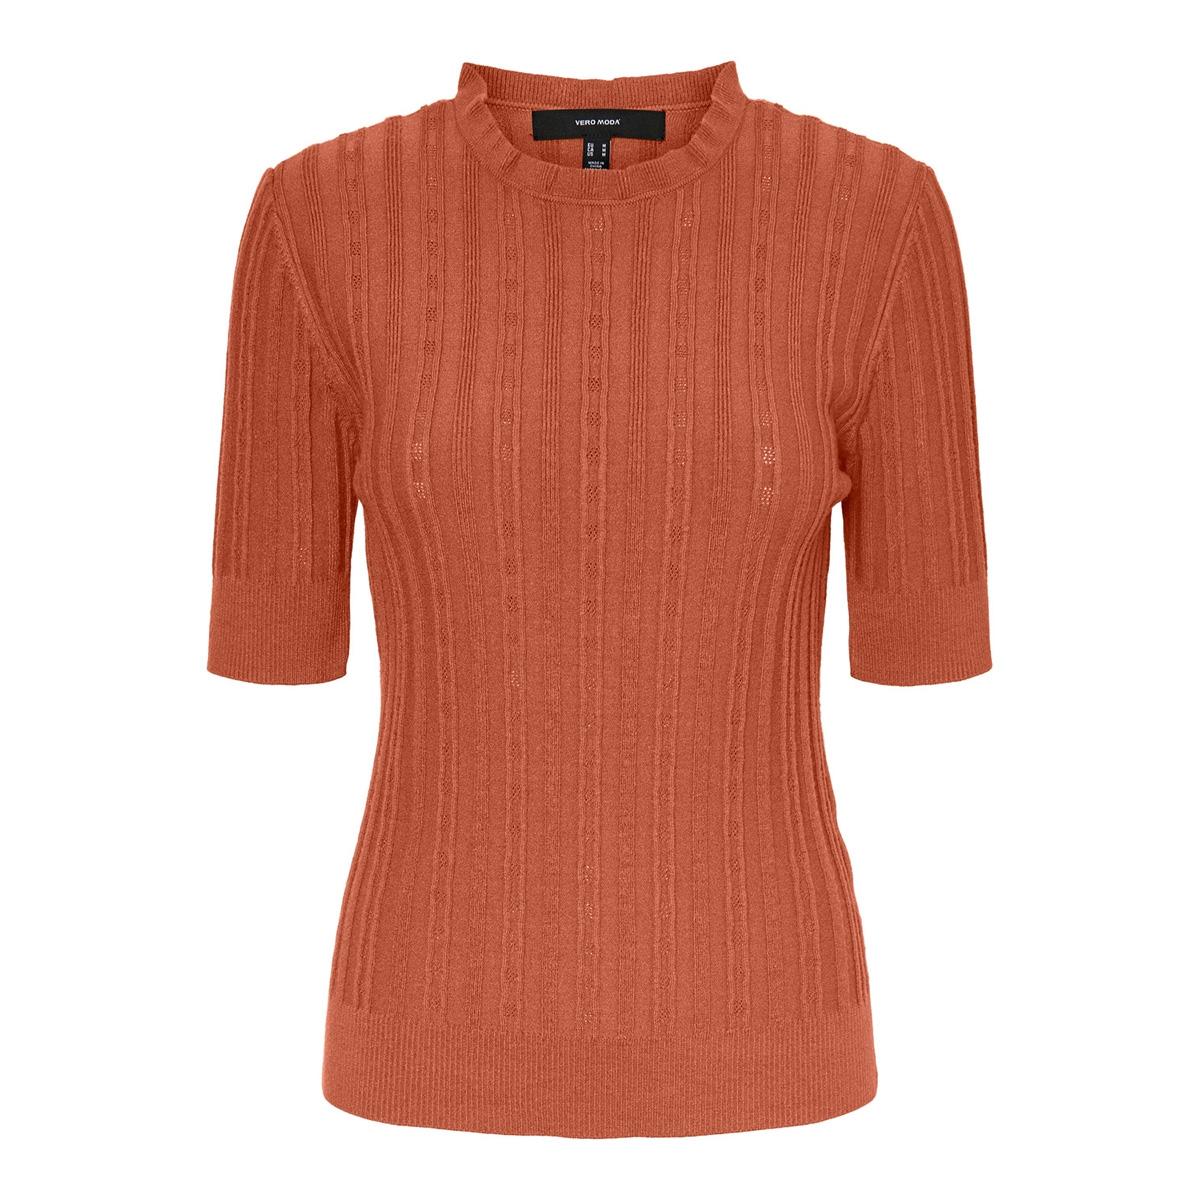 vmvitawave 2/4 highneck blouse ga 10232495 vero moda trui auburn